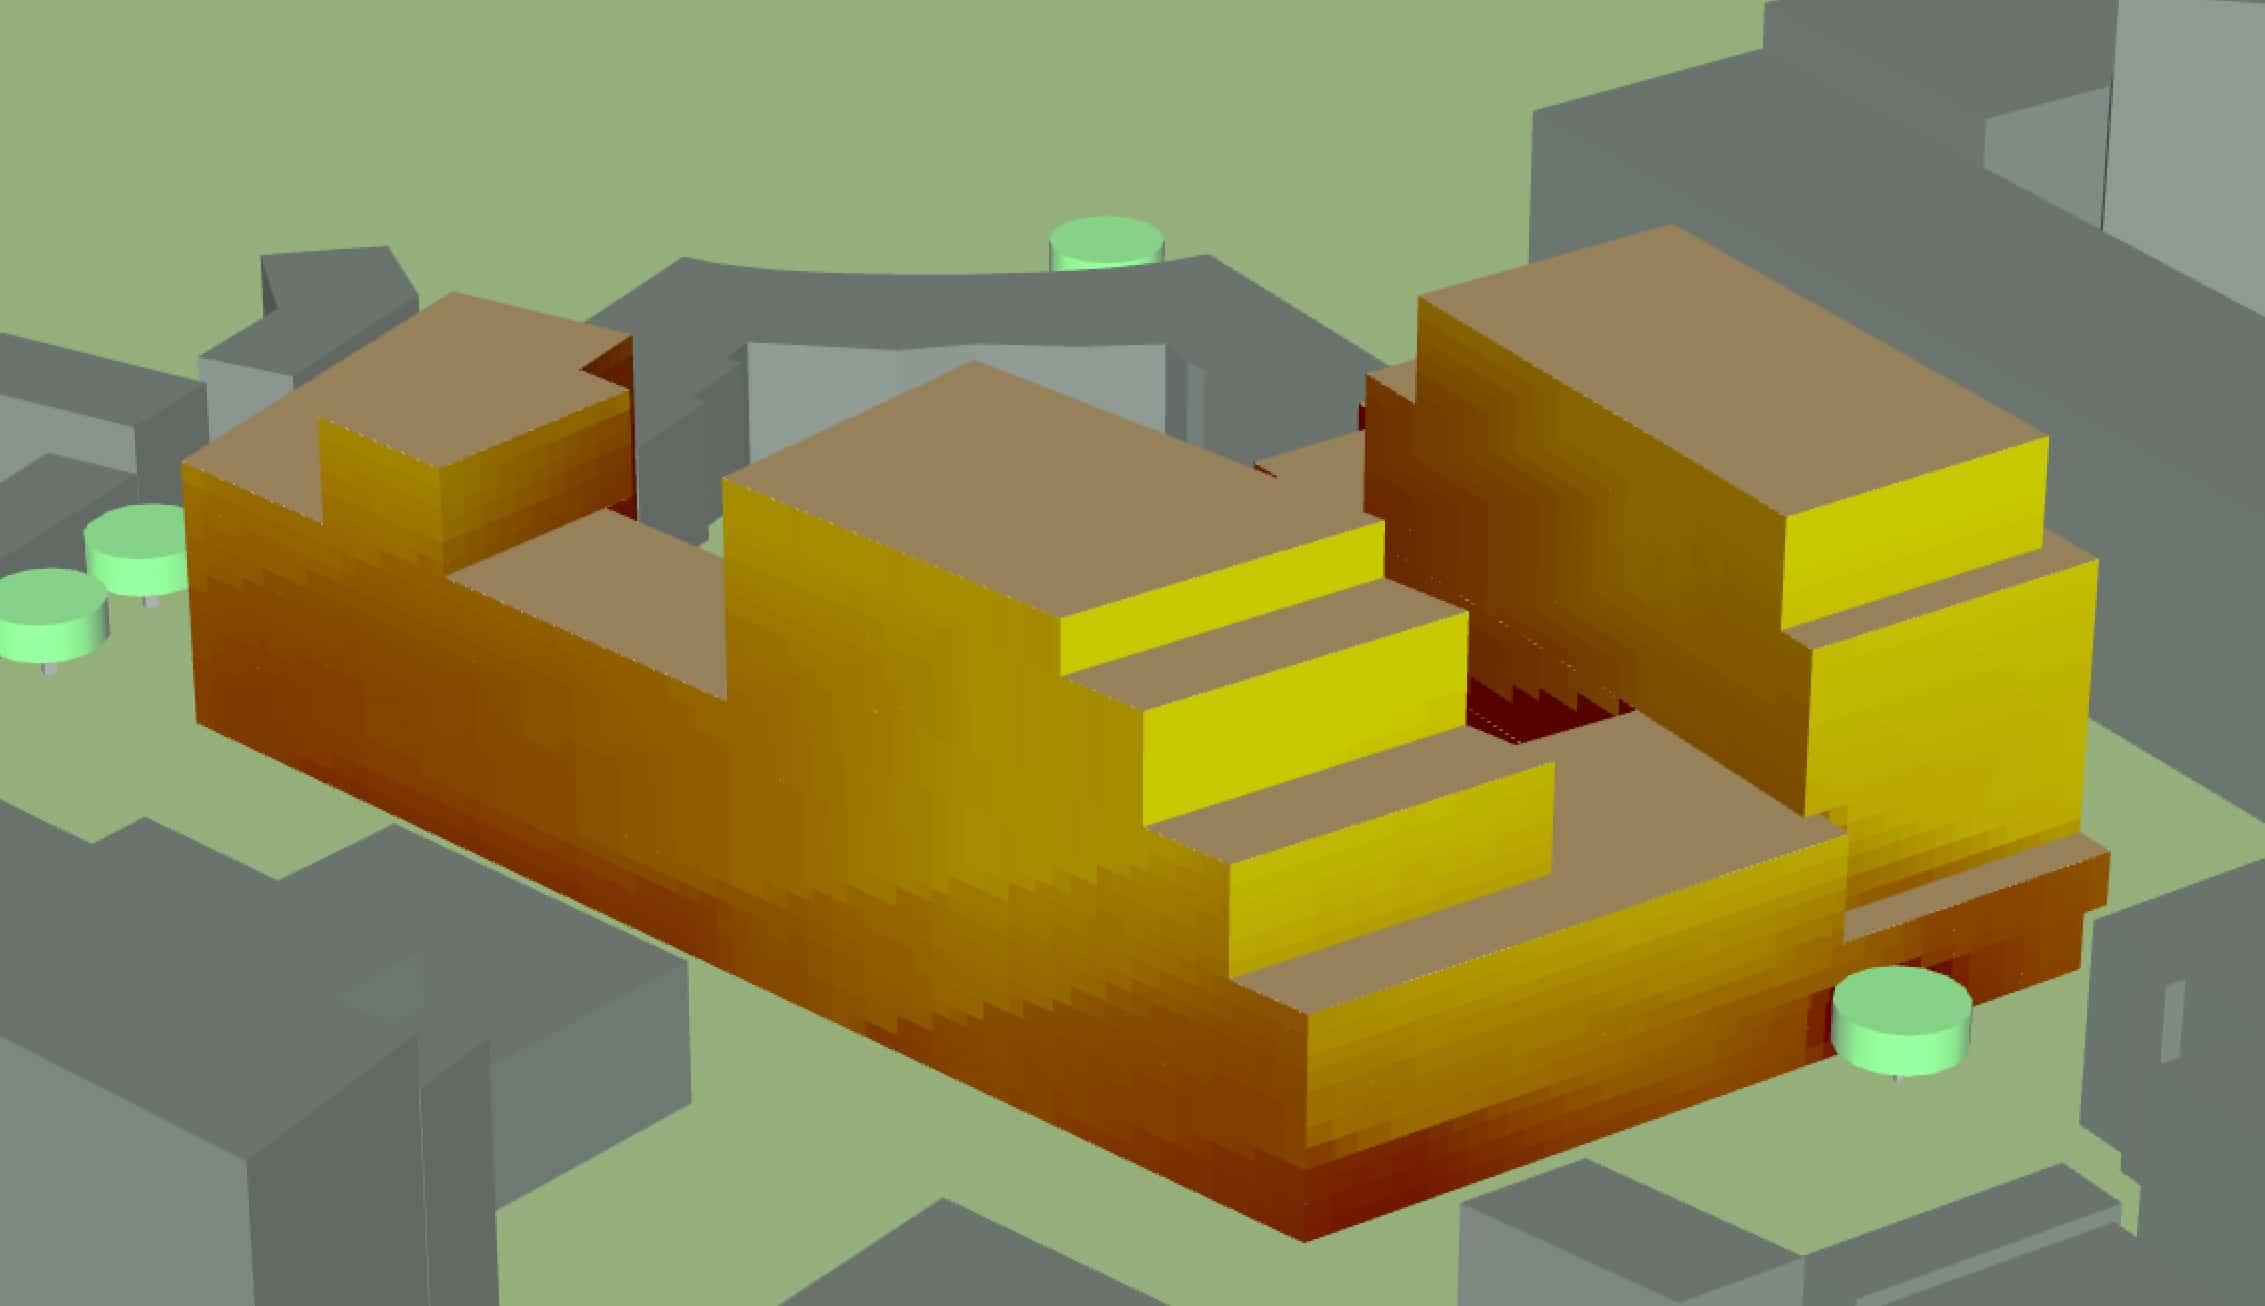 modelisation 3D logiciel pleiades modeleur